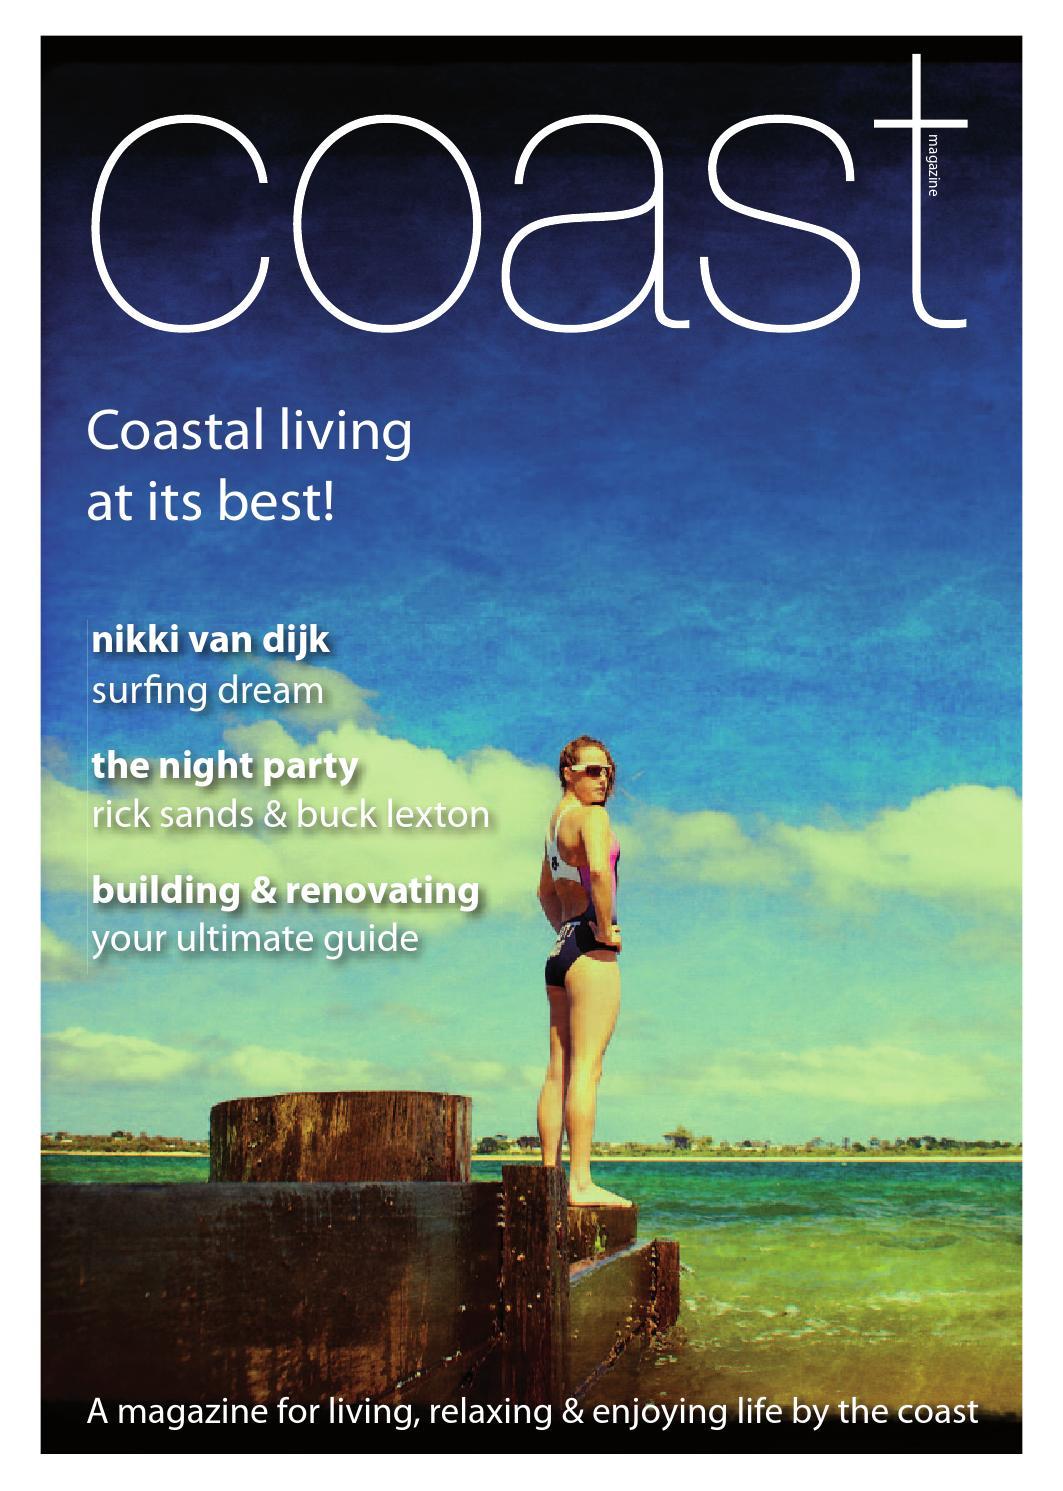 33 summer 2014 by Coast Media Pty Ltd - issuu